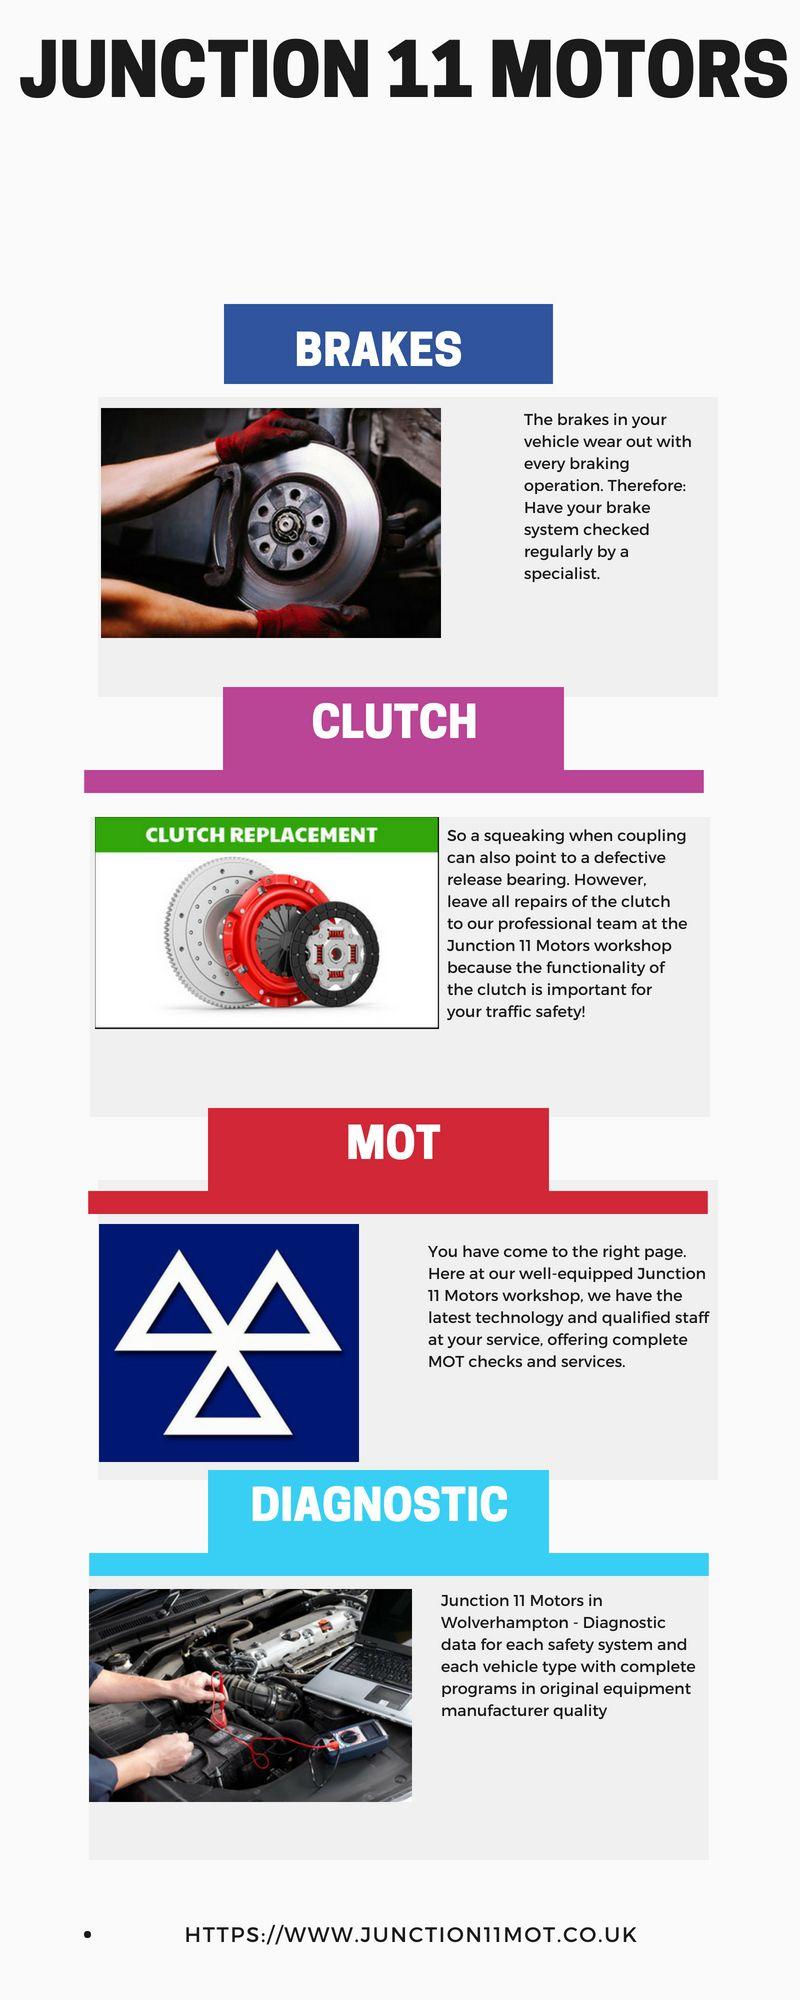 Junction 11 motors offering low cost brakes repair